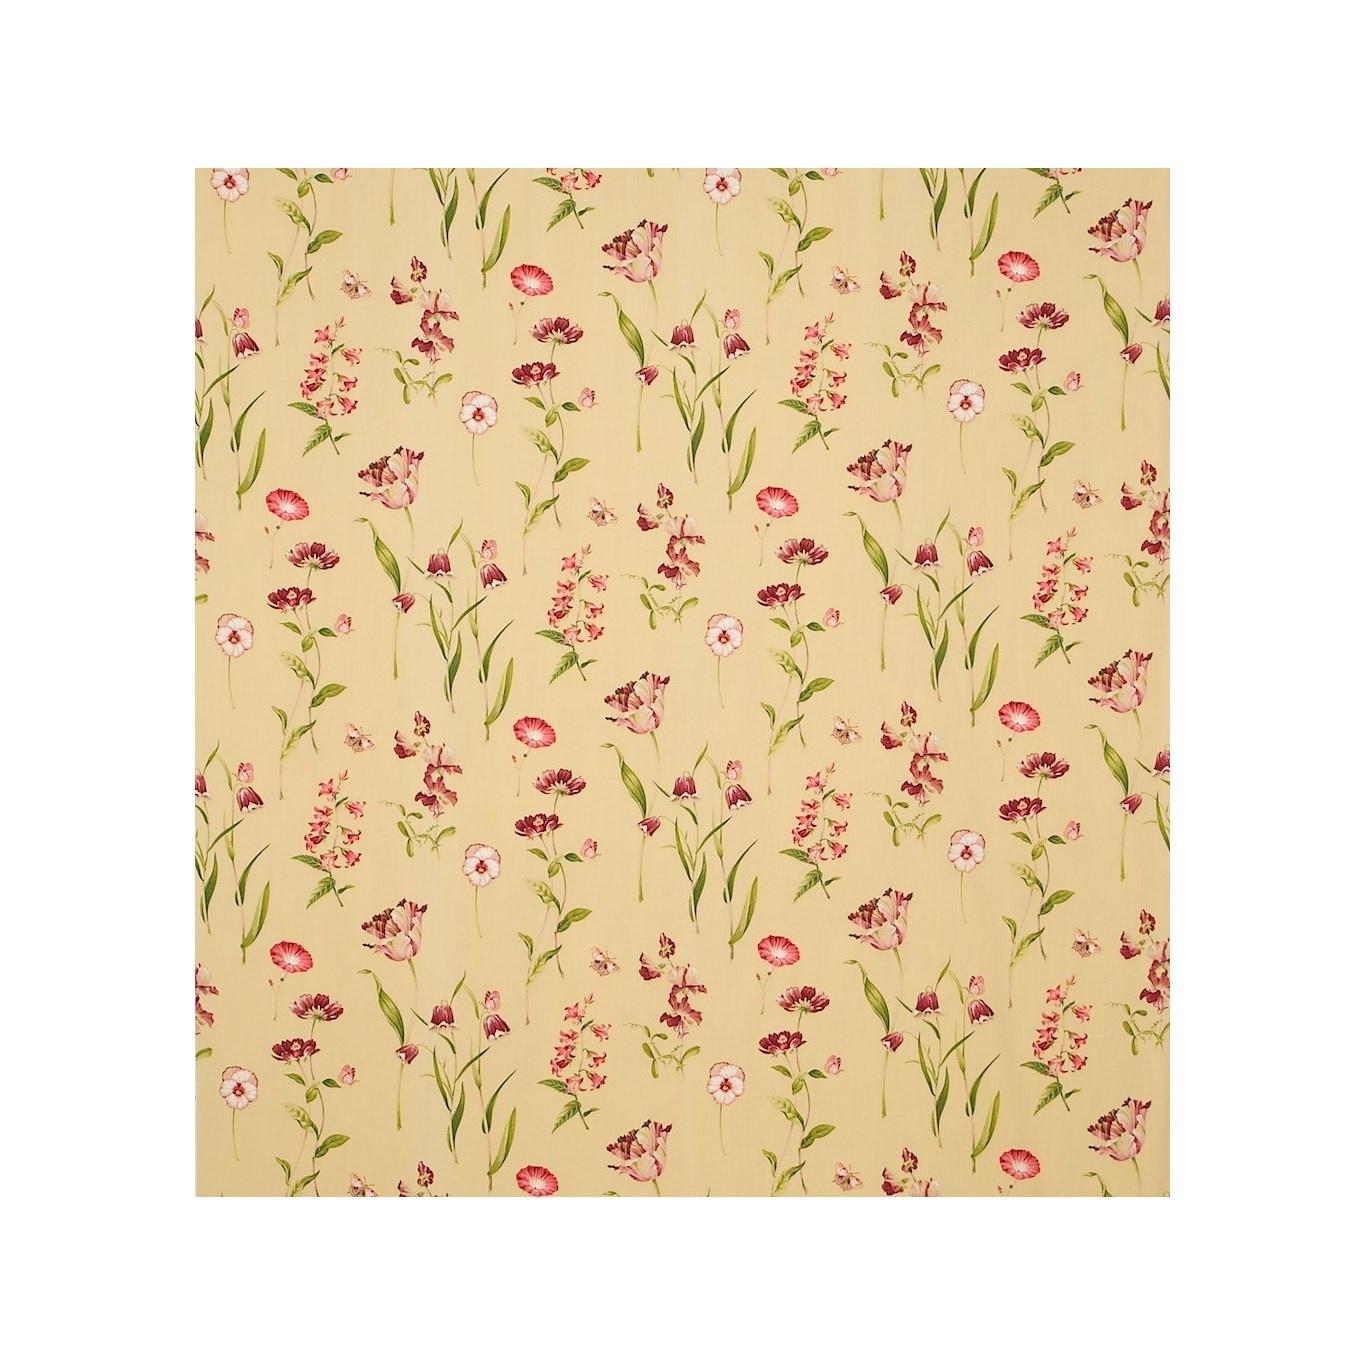 Image of Sanderson Butterfly Garden Curtain Fabric PR8626/1